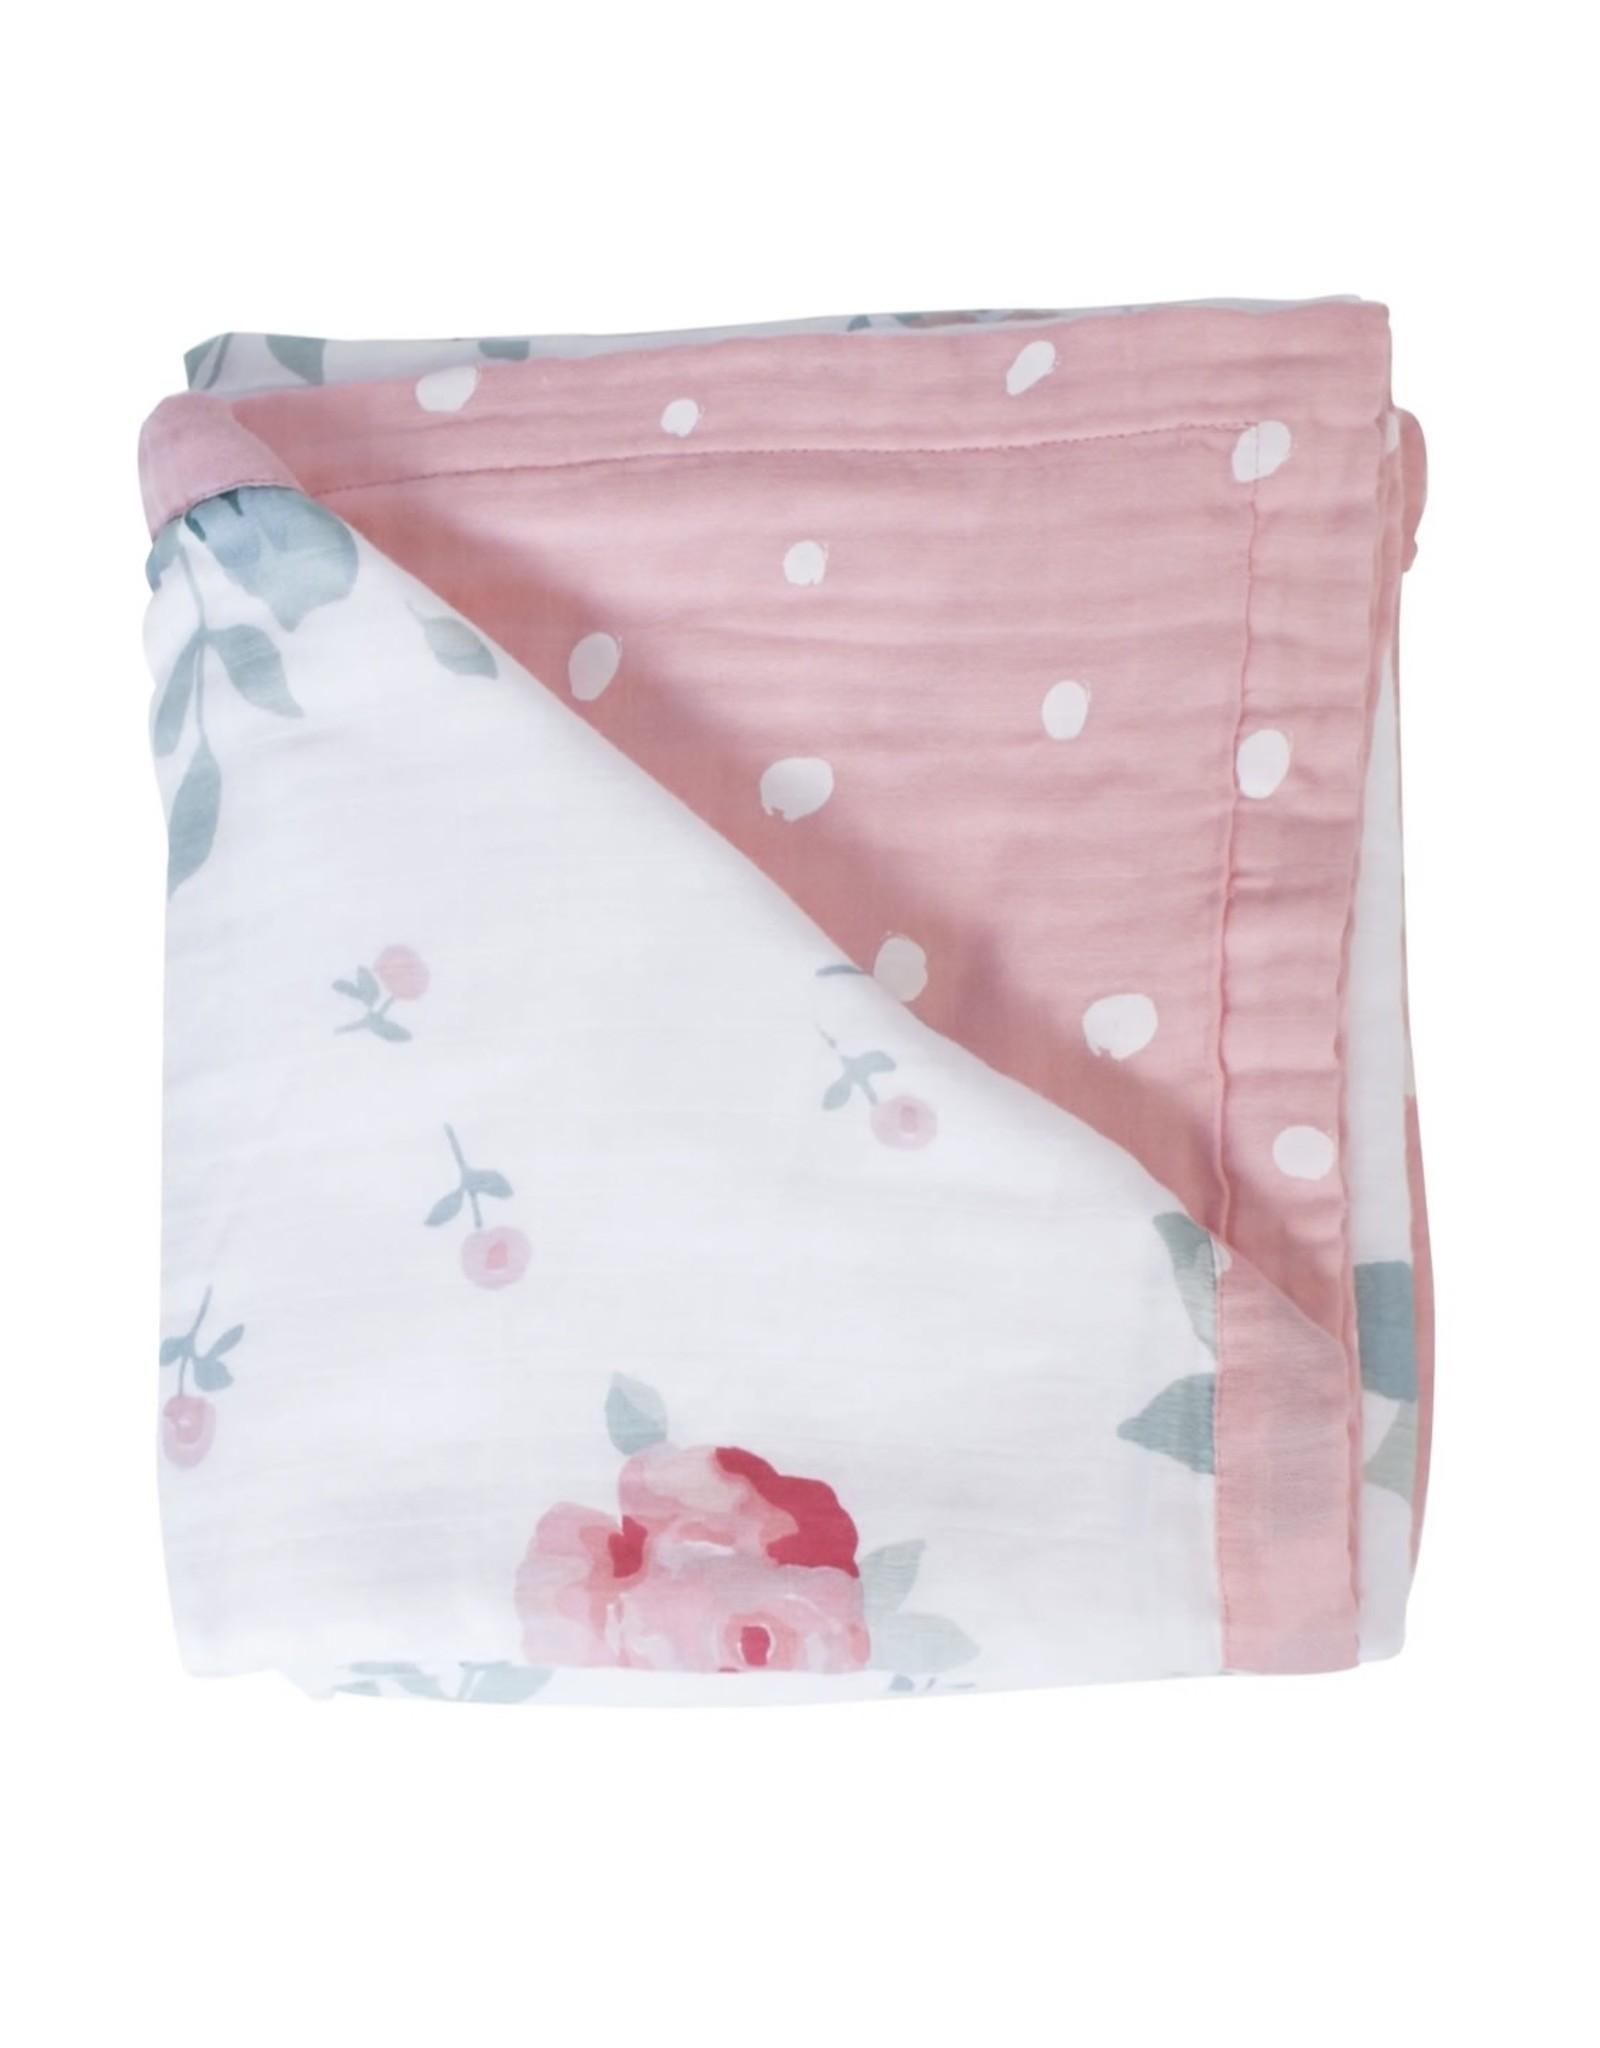 Bebe Au Lait Bebe Au Lait- Rosy & Dewdrops Oh-So-Soft Muslin Snuggle Blanket